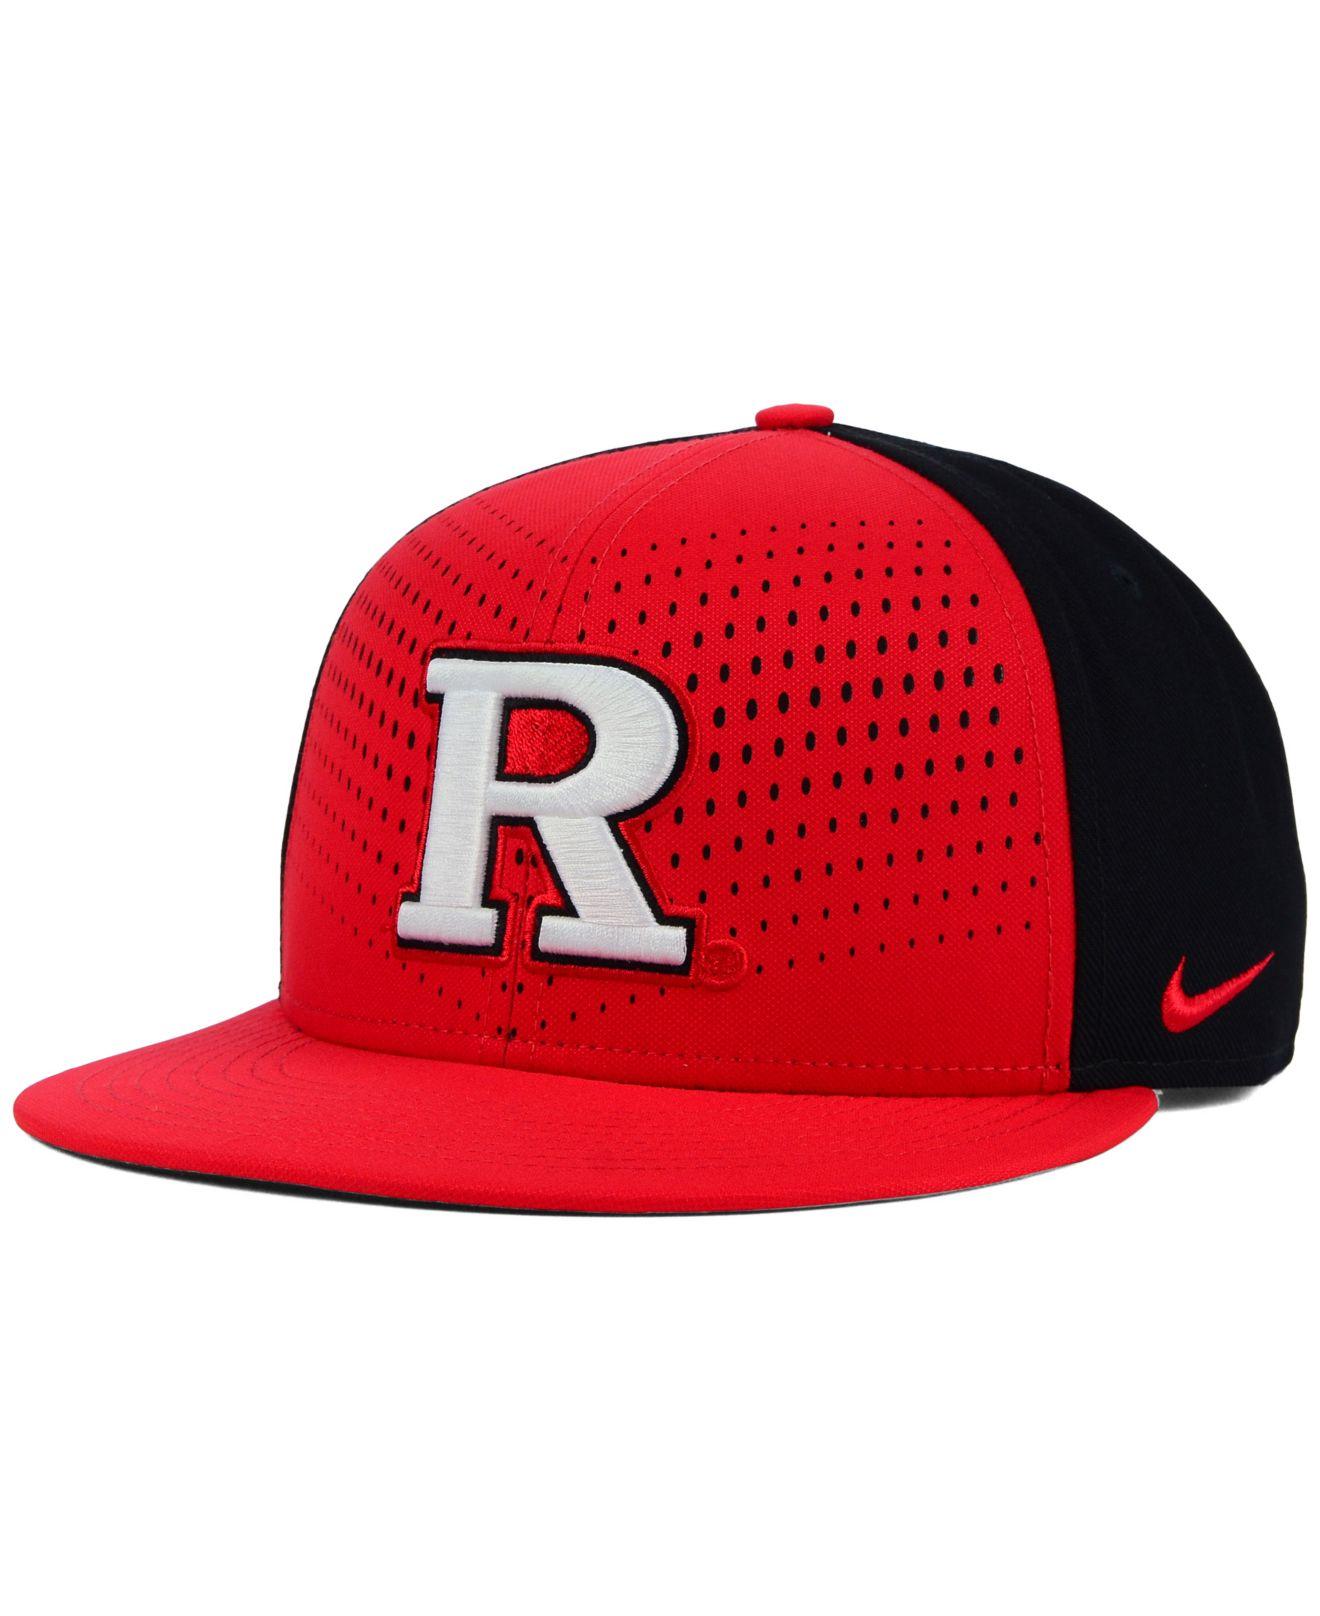 ... clearance lyst nike rutgers scarlet knights true seasonal snapback cap  in red for men 75191 d8ac3 5c6103755a05